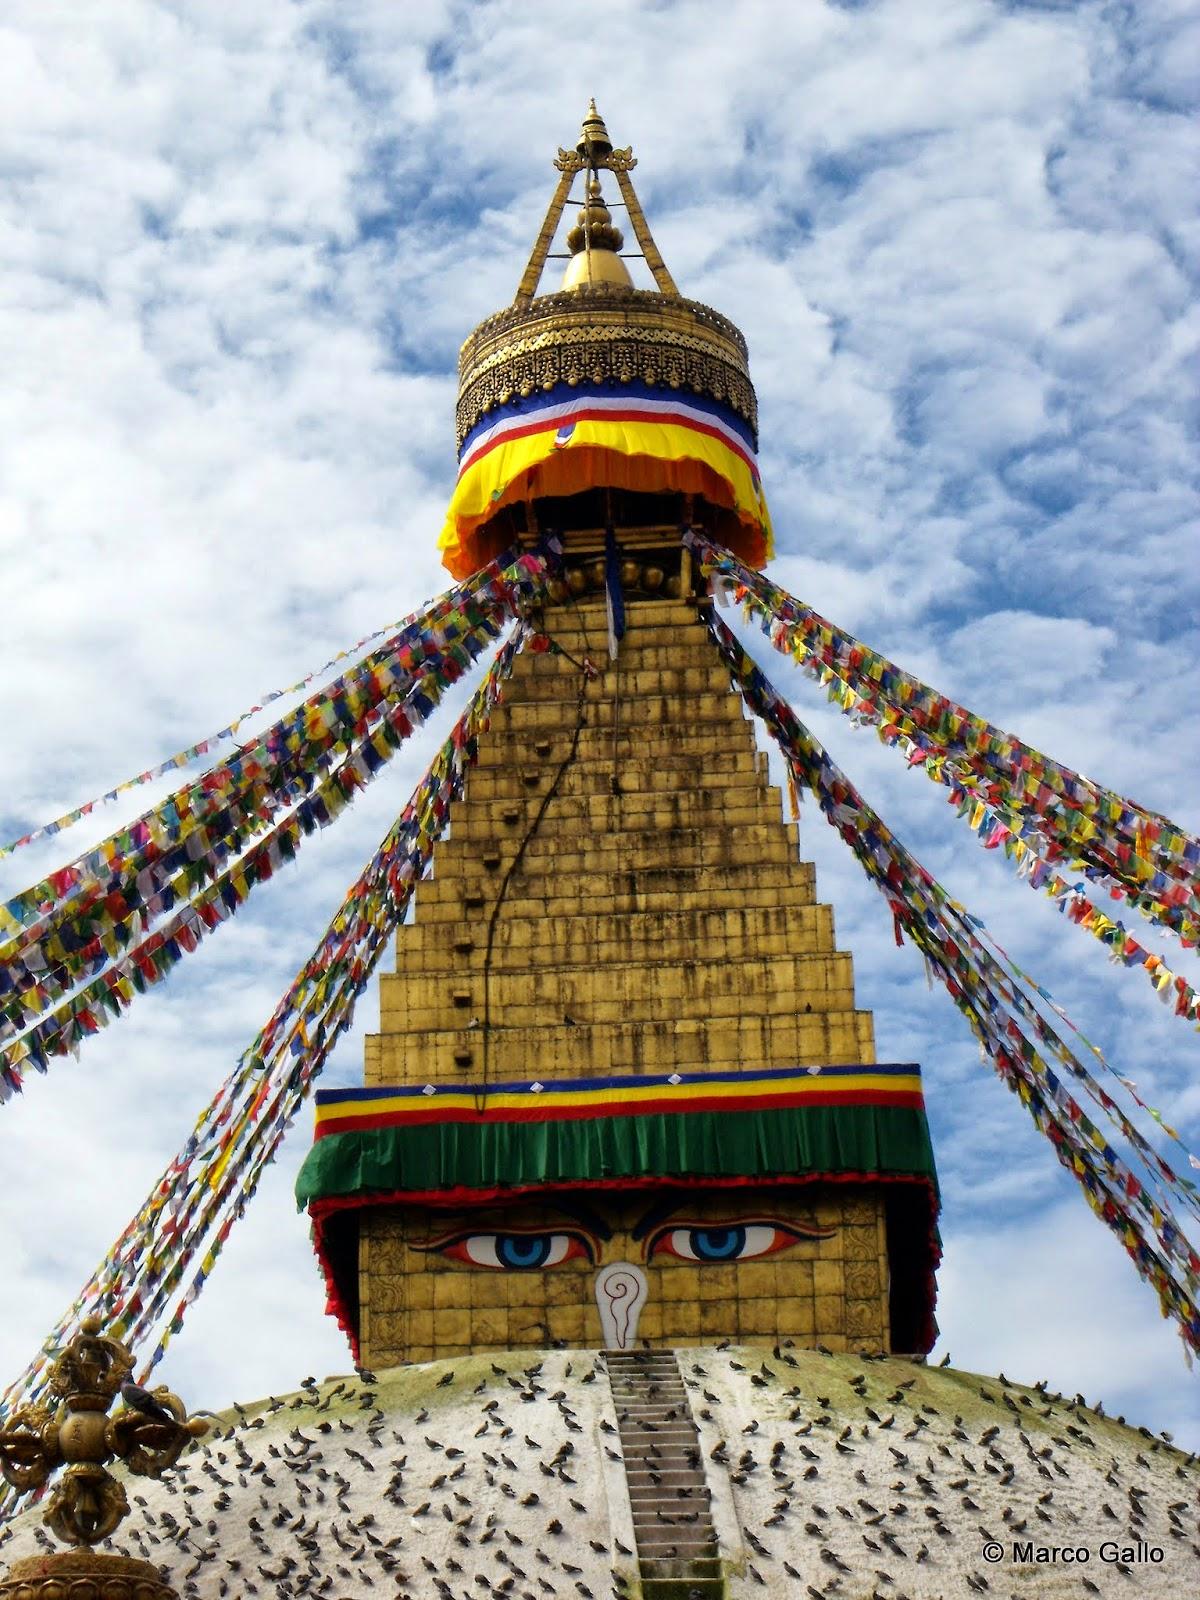 http://doshaciendofotos.blogspot.com.es/2015/04/boudhanath-katmandu-nepal.html